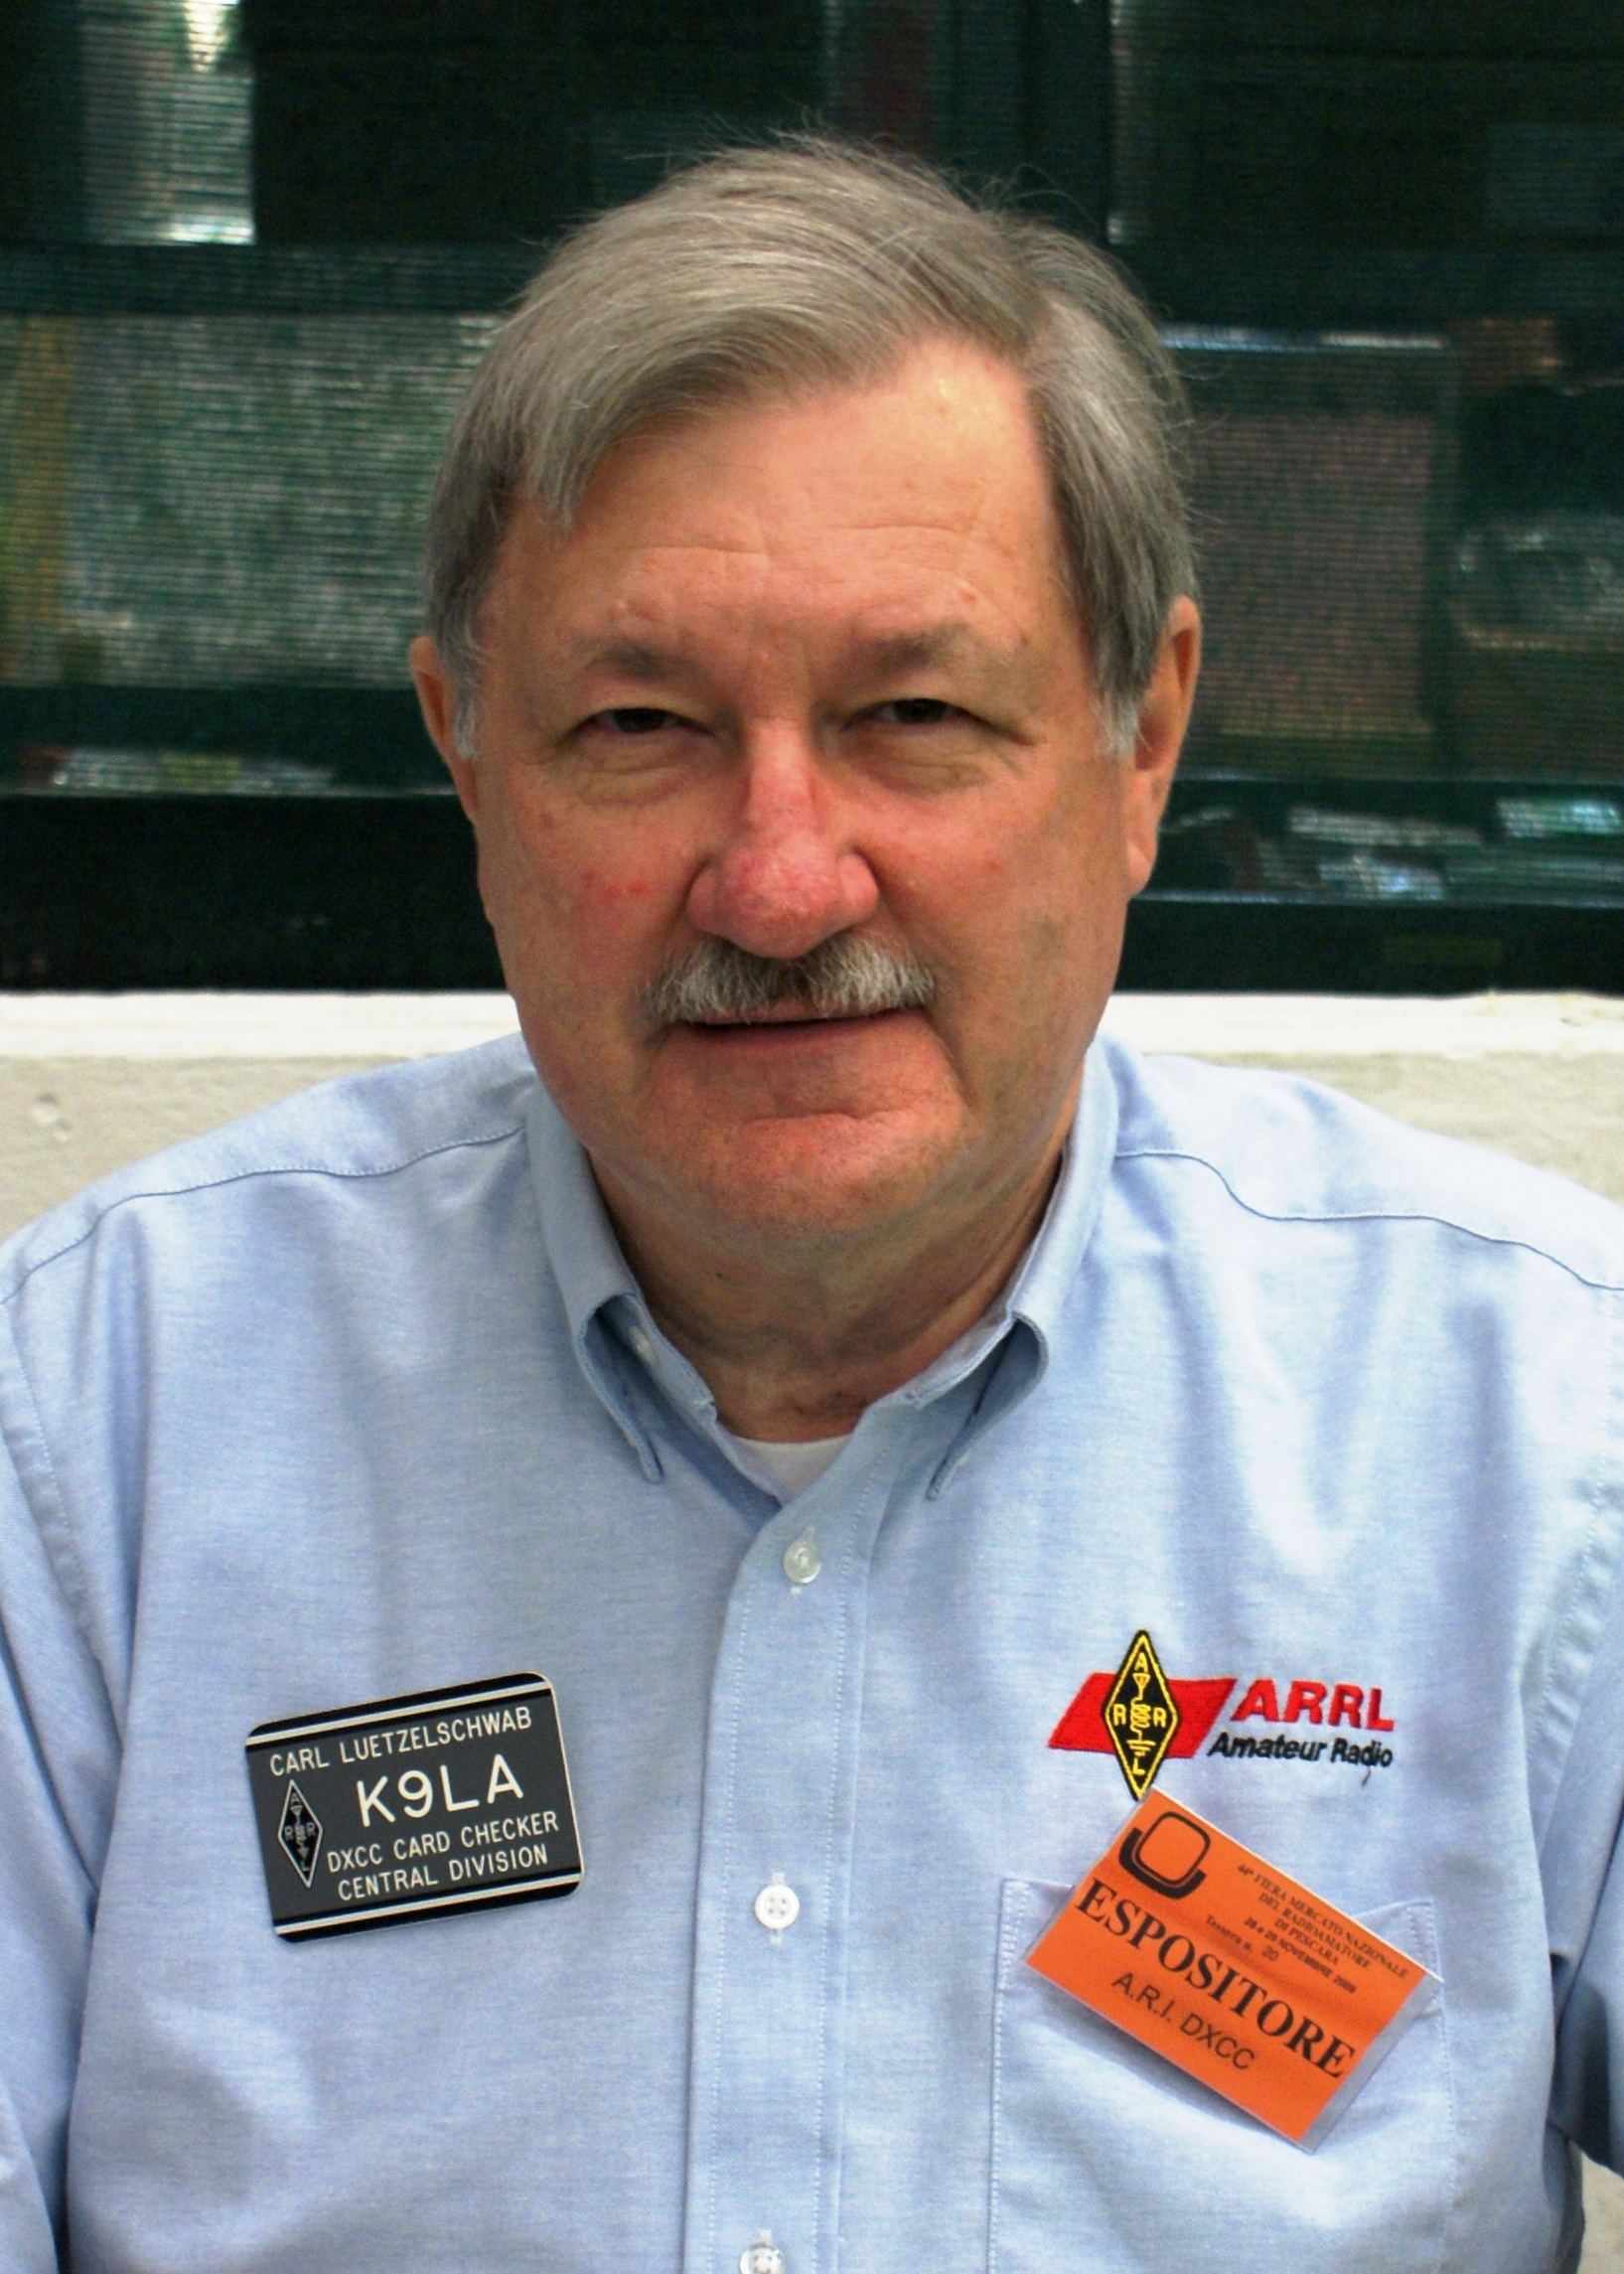 ARRL Central Division Vice Director Carl Luetzelschwab, K9LA